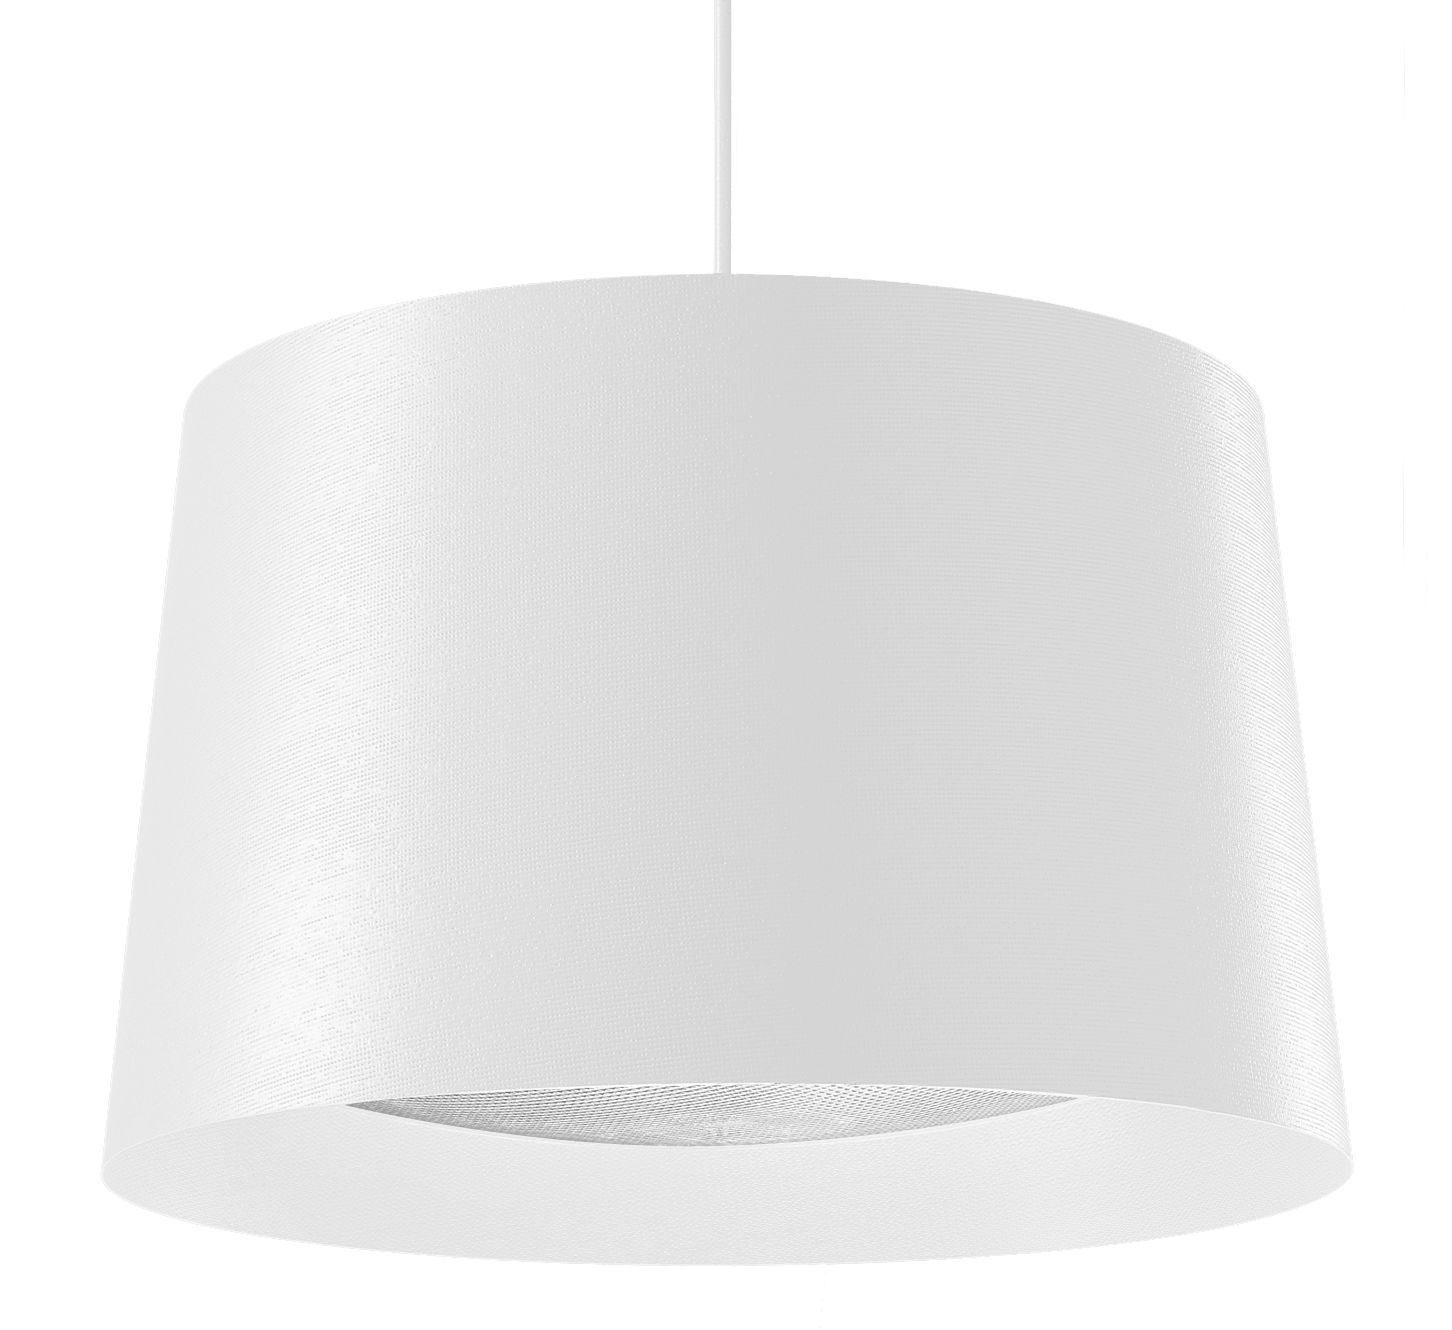 Lighting - Pendant Lighting - Twiggy Large Pendant - Large model by Foscarini - White - Composite material, Fibreglass